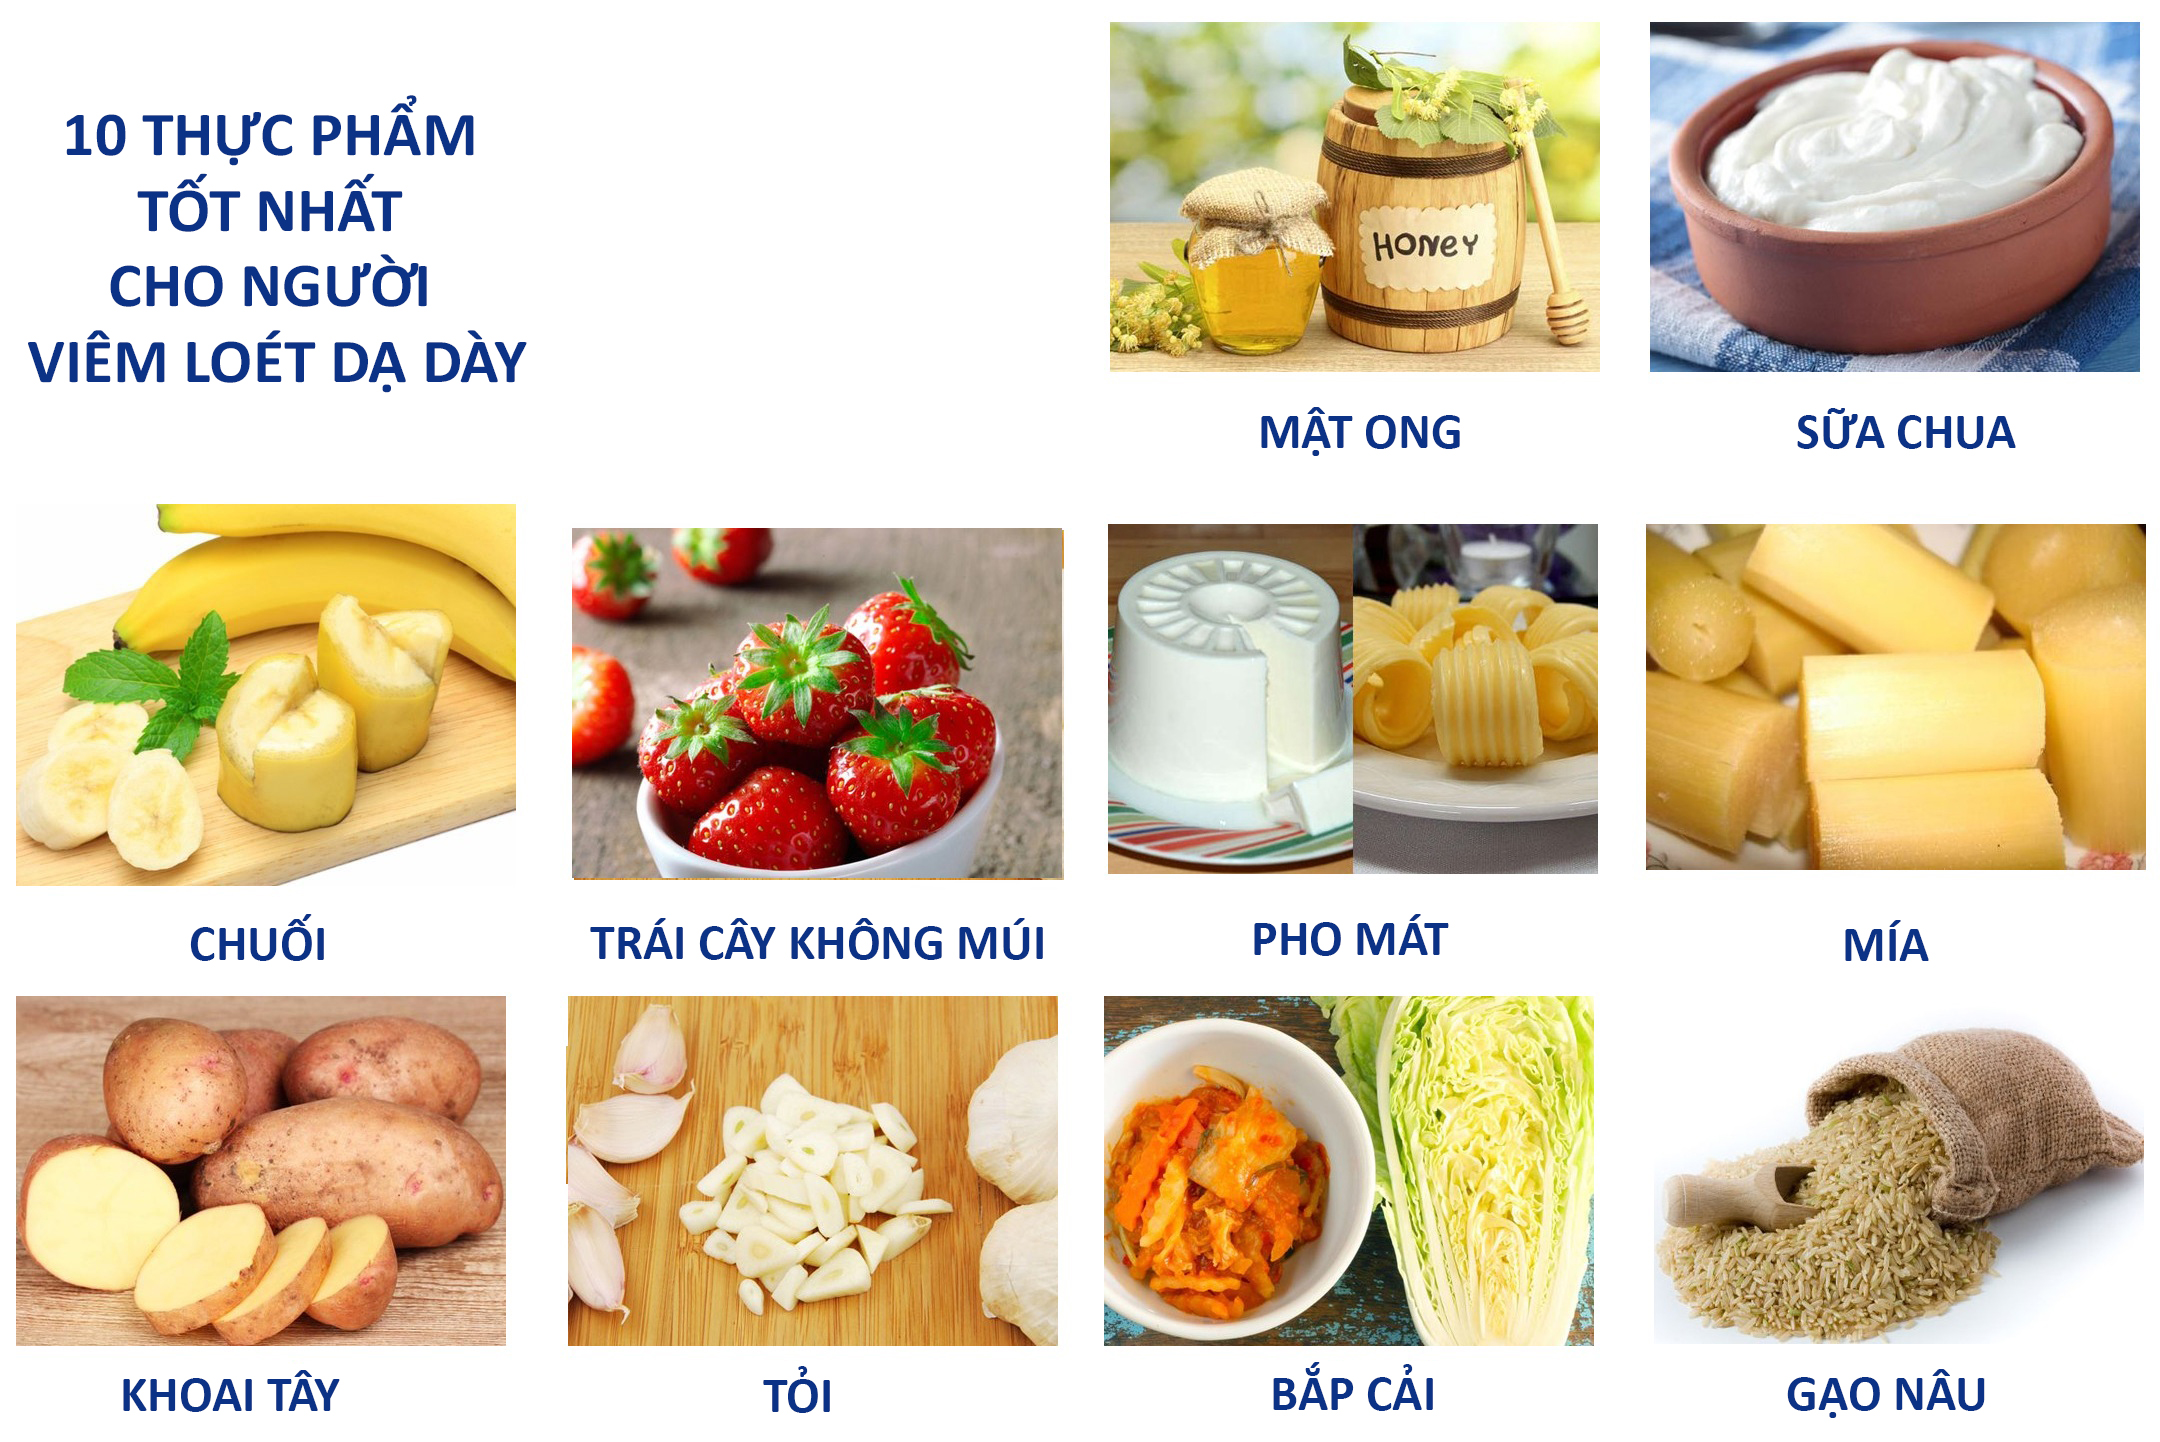 che-do-an-uong-cho-benh-nhan-viem-loet-da-day-ta-trang